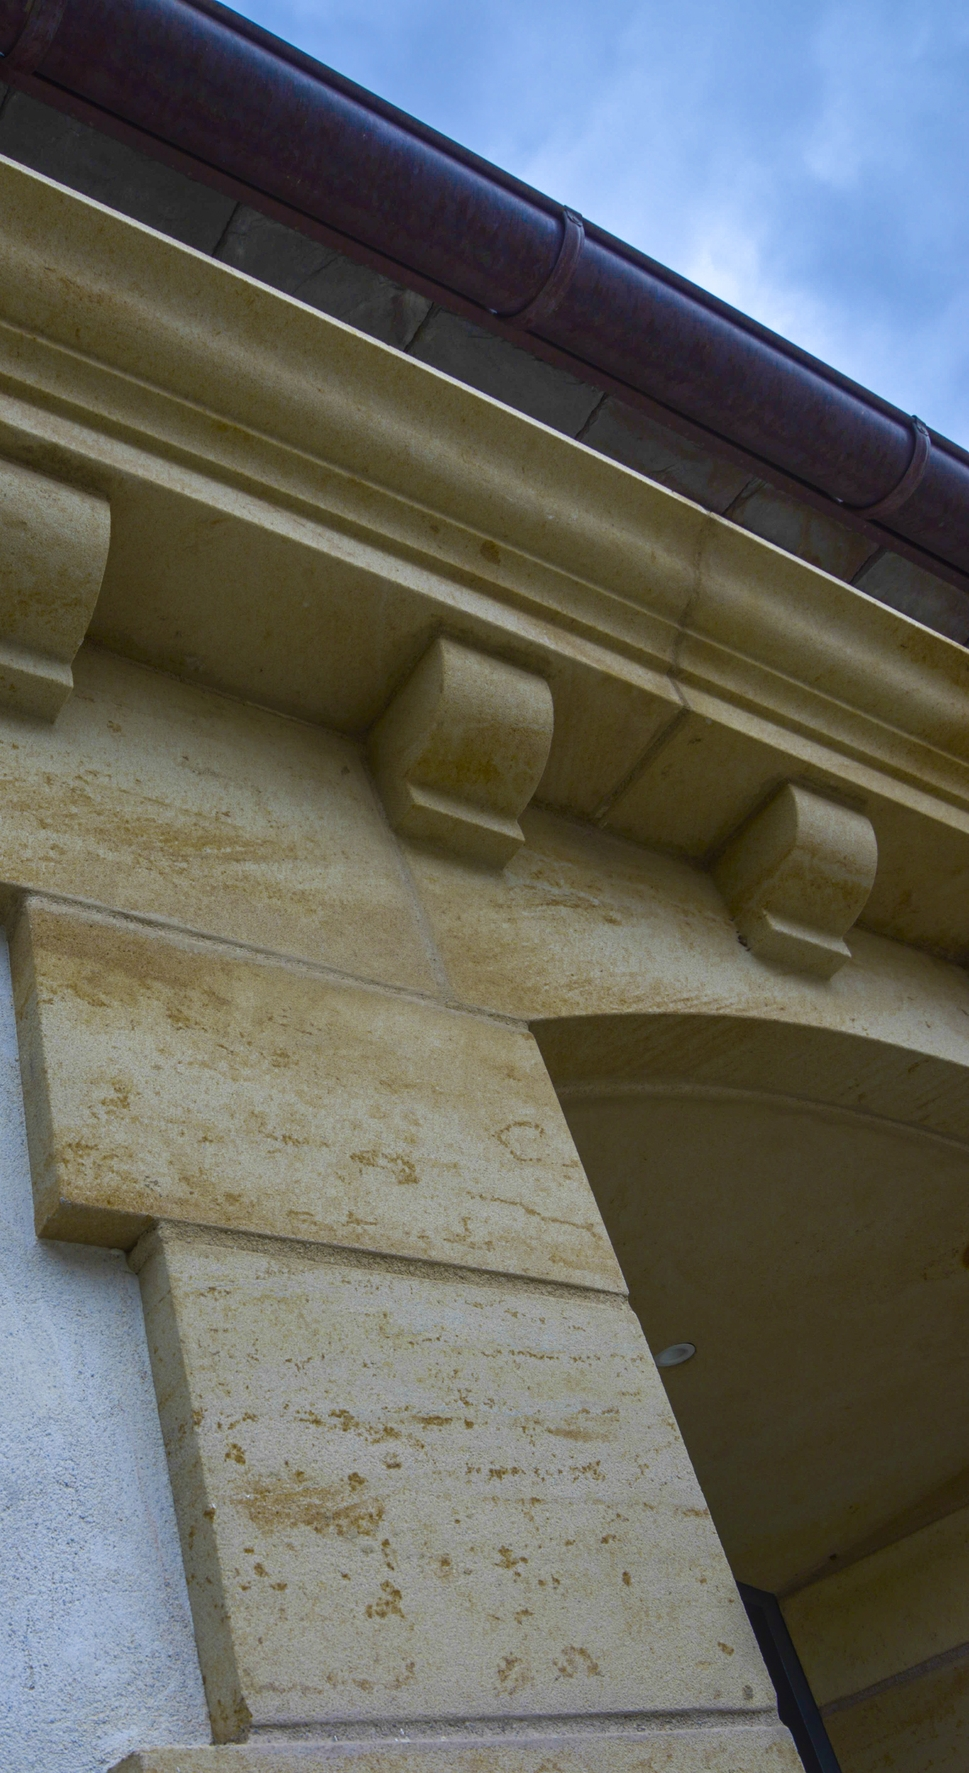 matrka edington home details 3A.JPG